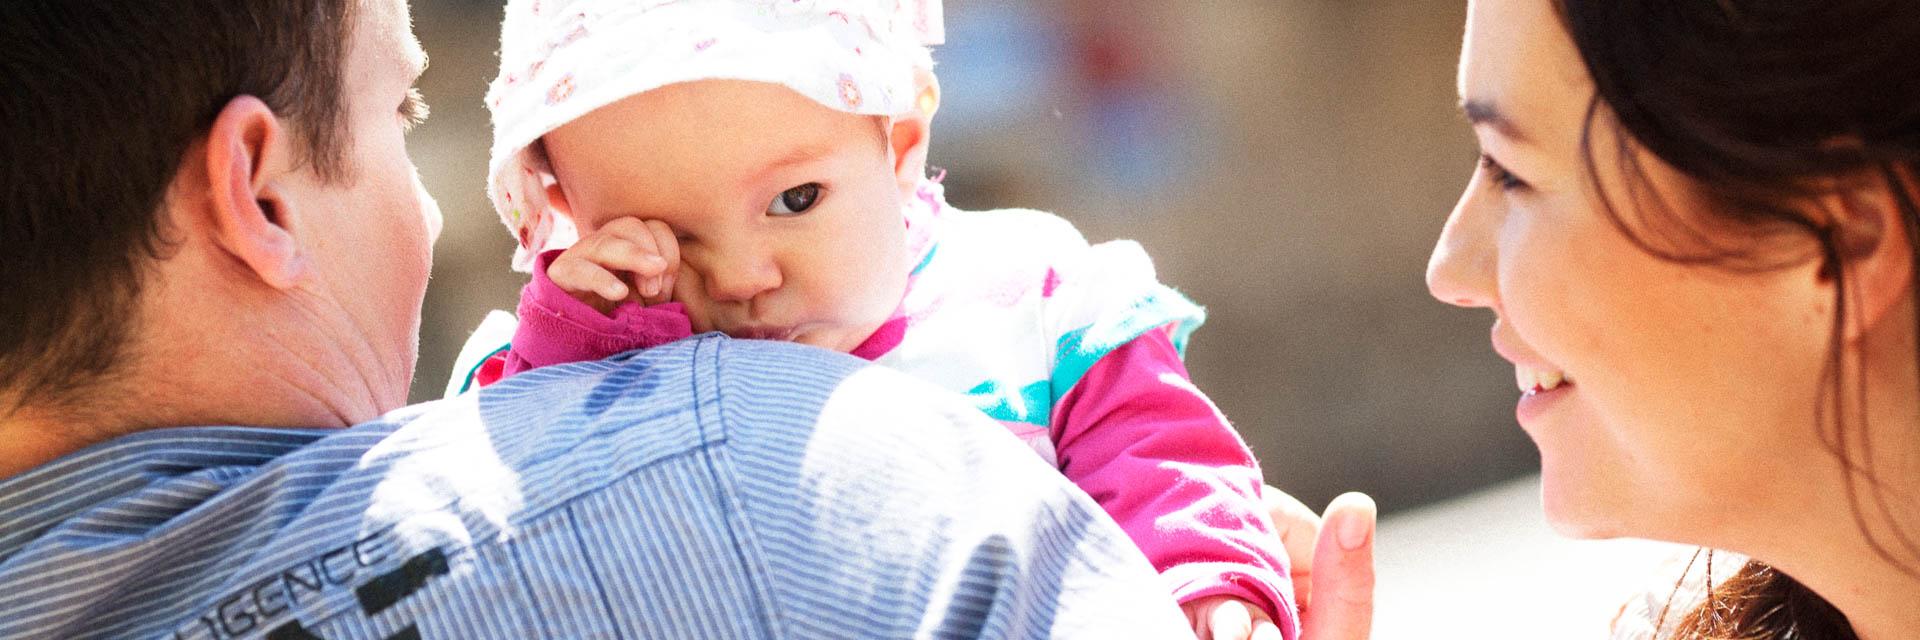 babyfotoshooting dresden